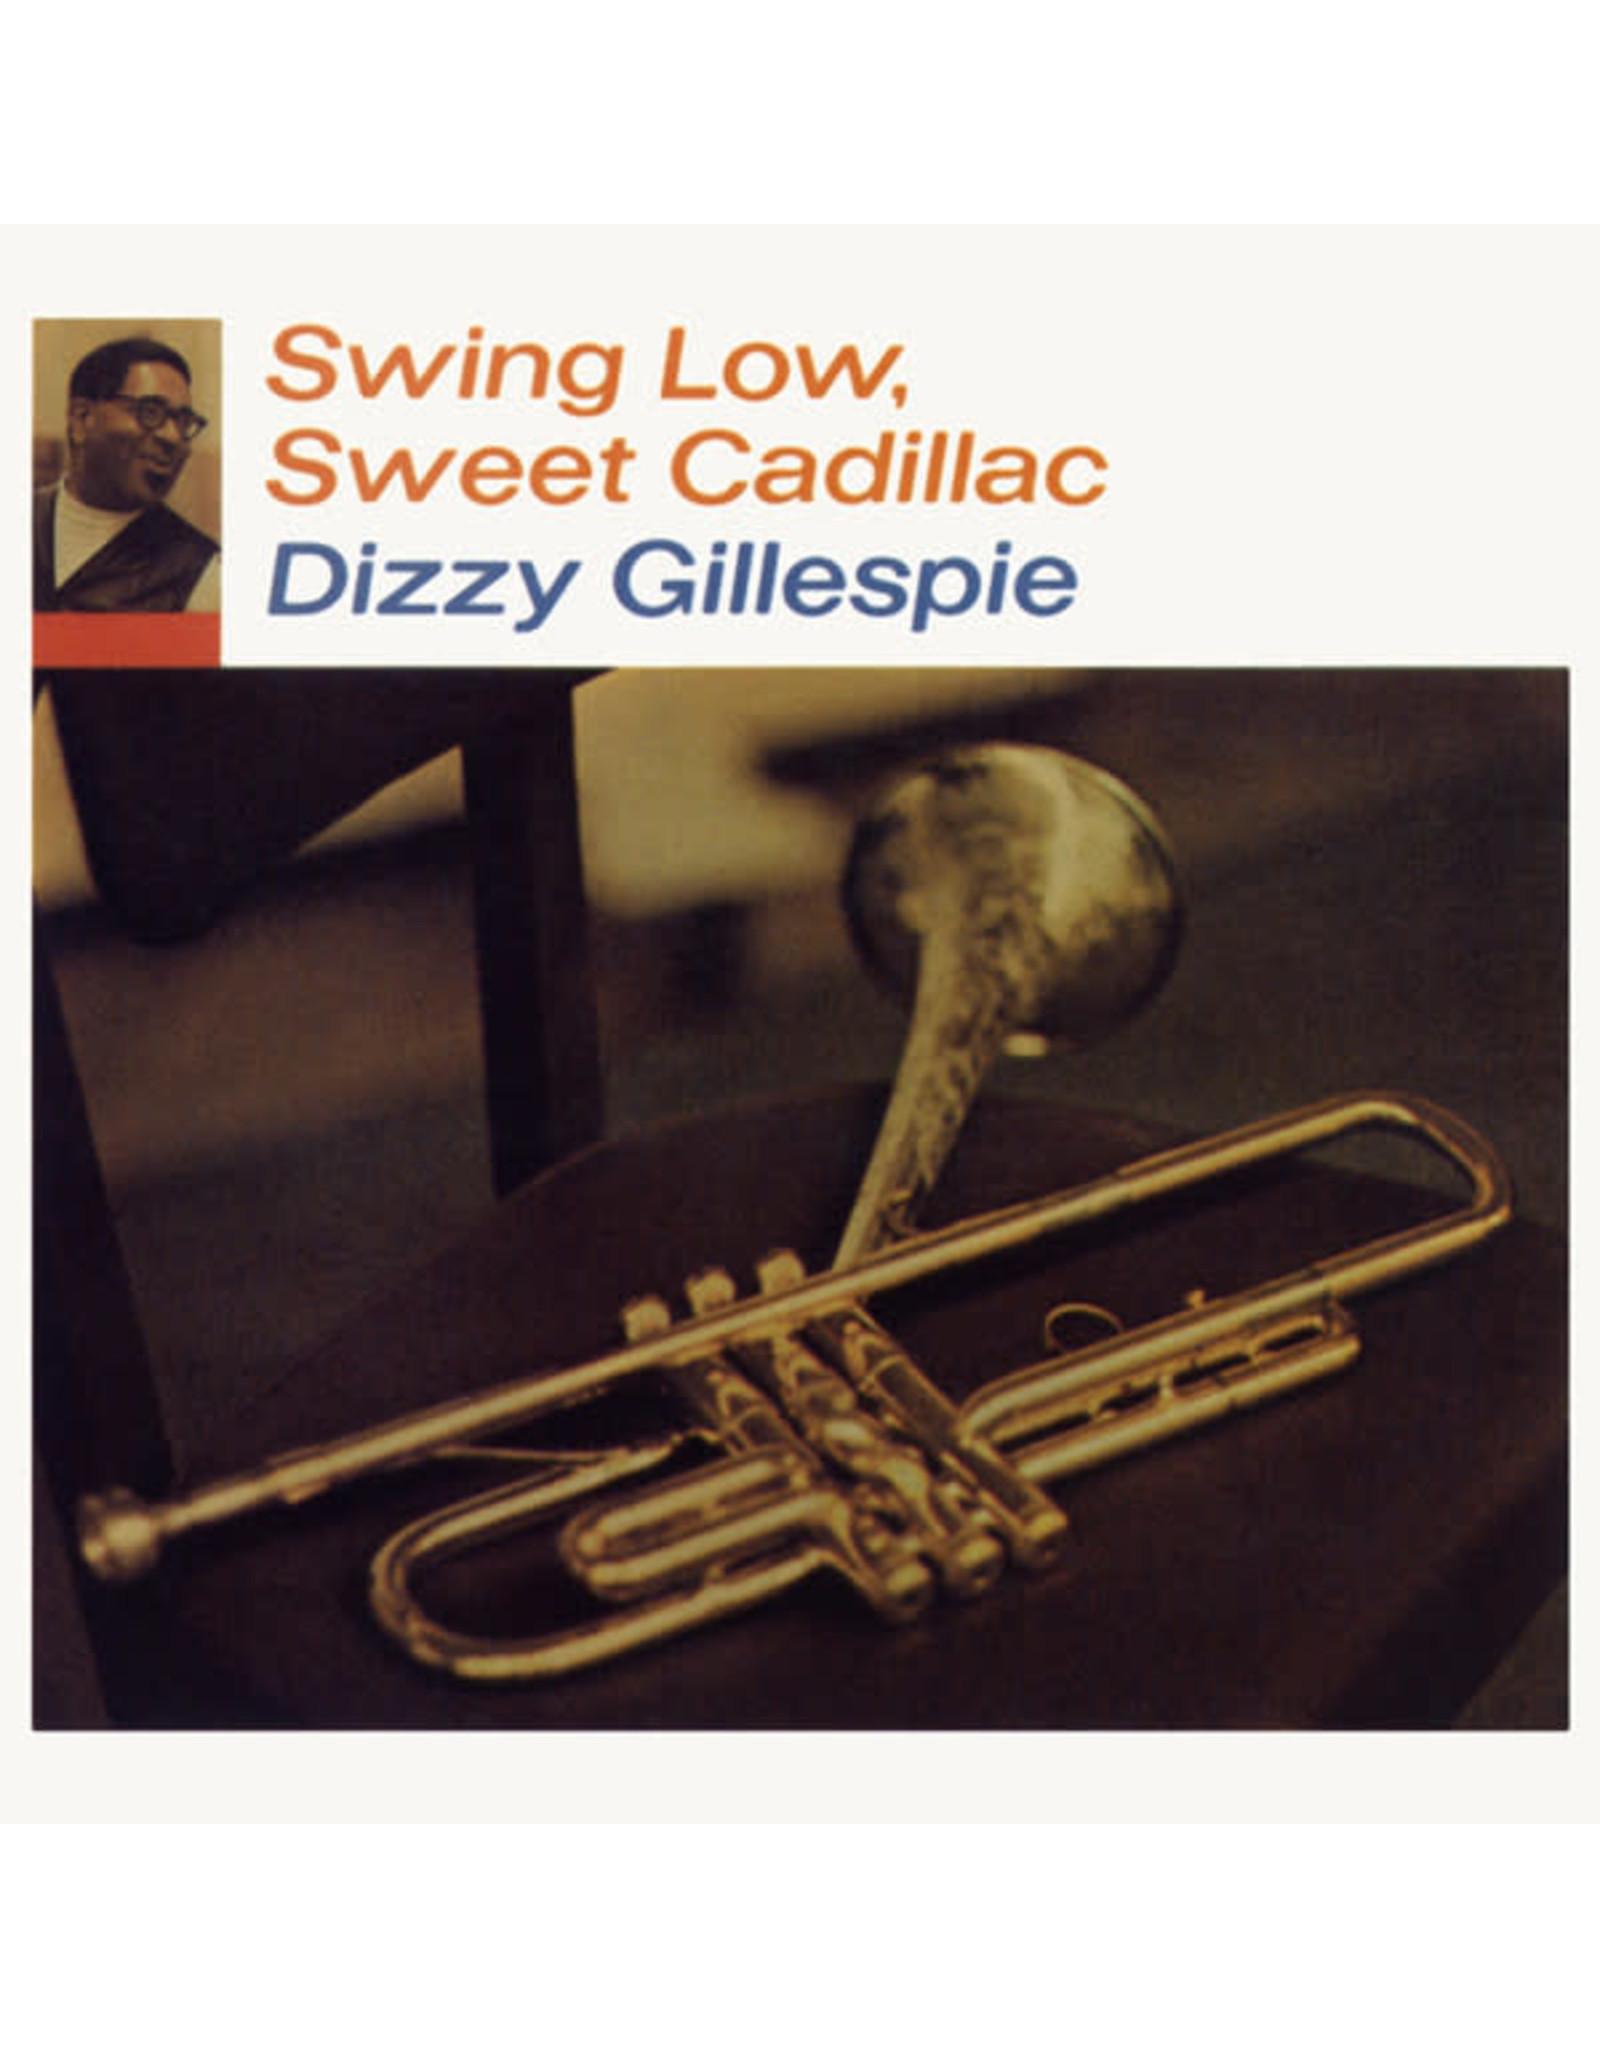 Dizzy Gillespie - Swing Low, Sweet Cadillac (Mono)